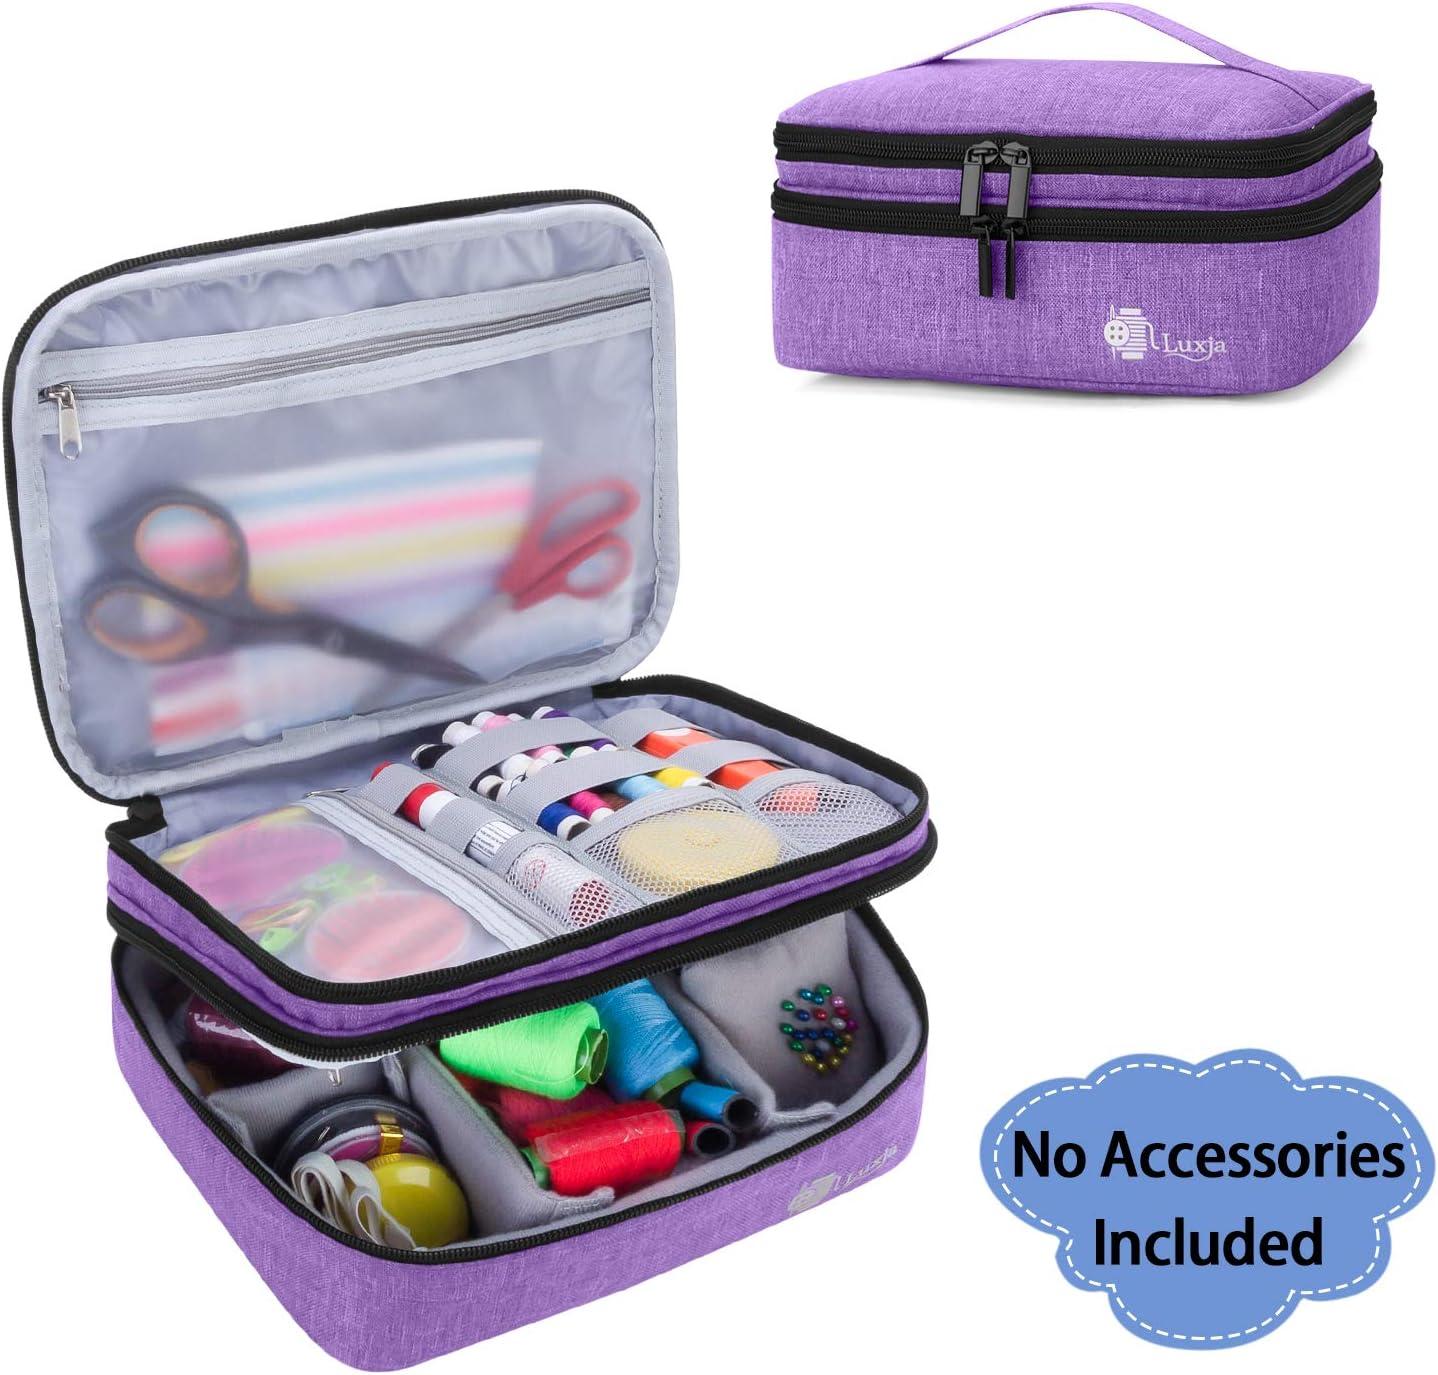 Purple Knitting Needles Case Magnetic Pin Cushion Sewing Storage Box Handcraft Needlework Sewing Tools Organizer Metal Needle Accessory